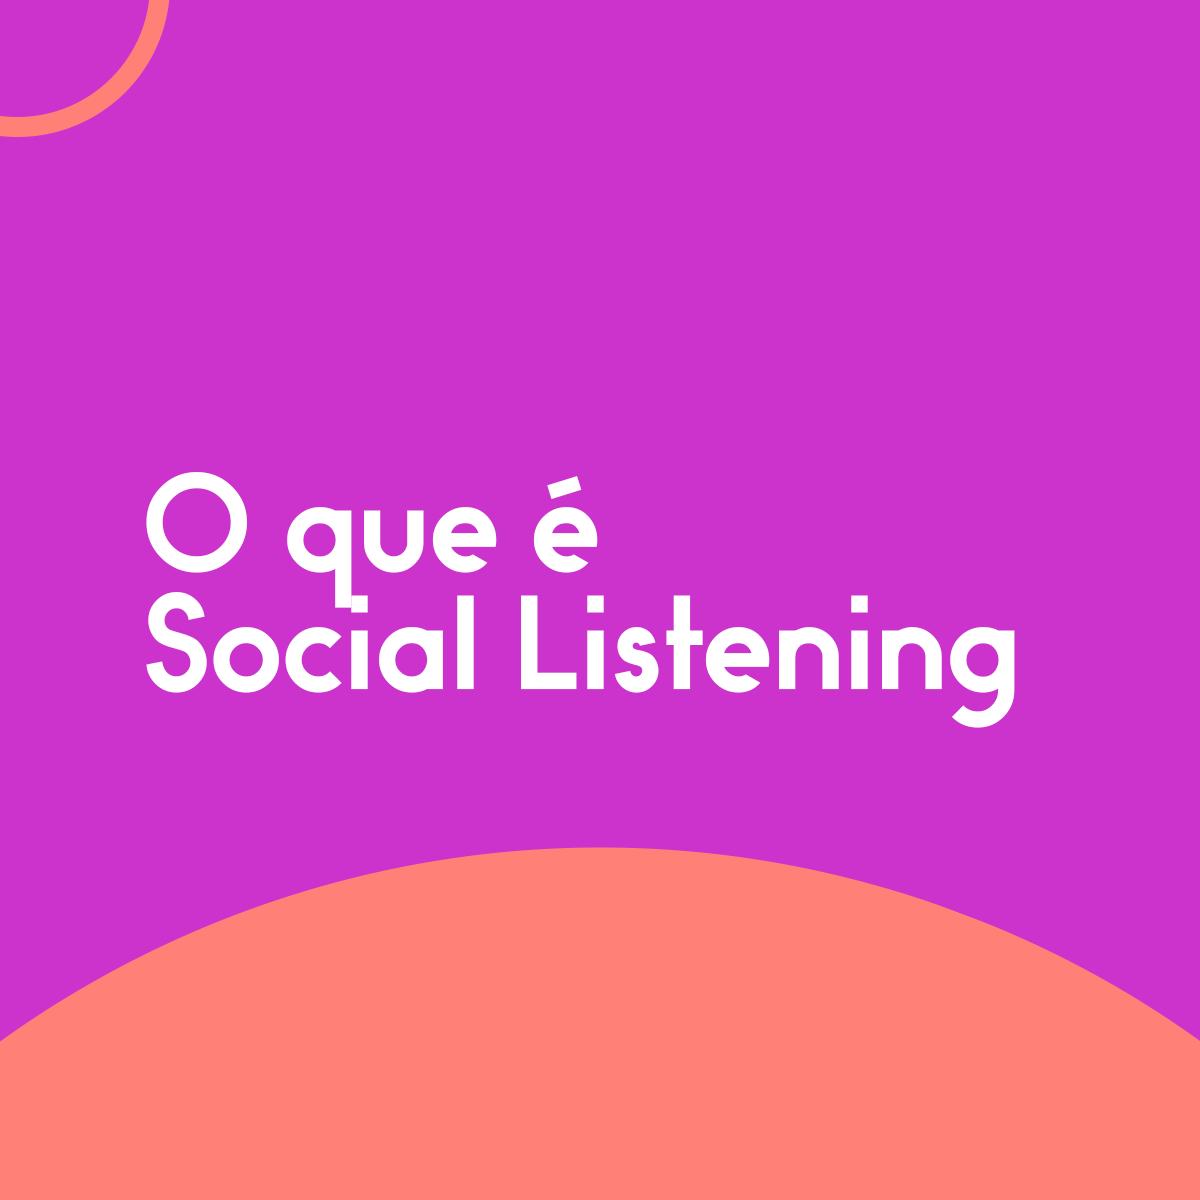 O-que-é-Social-Listening